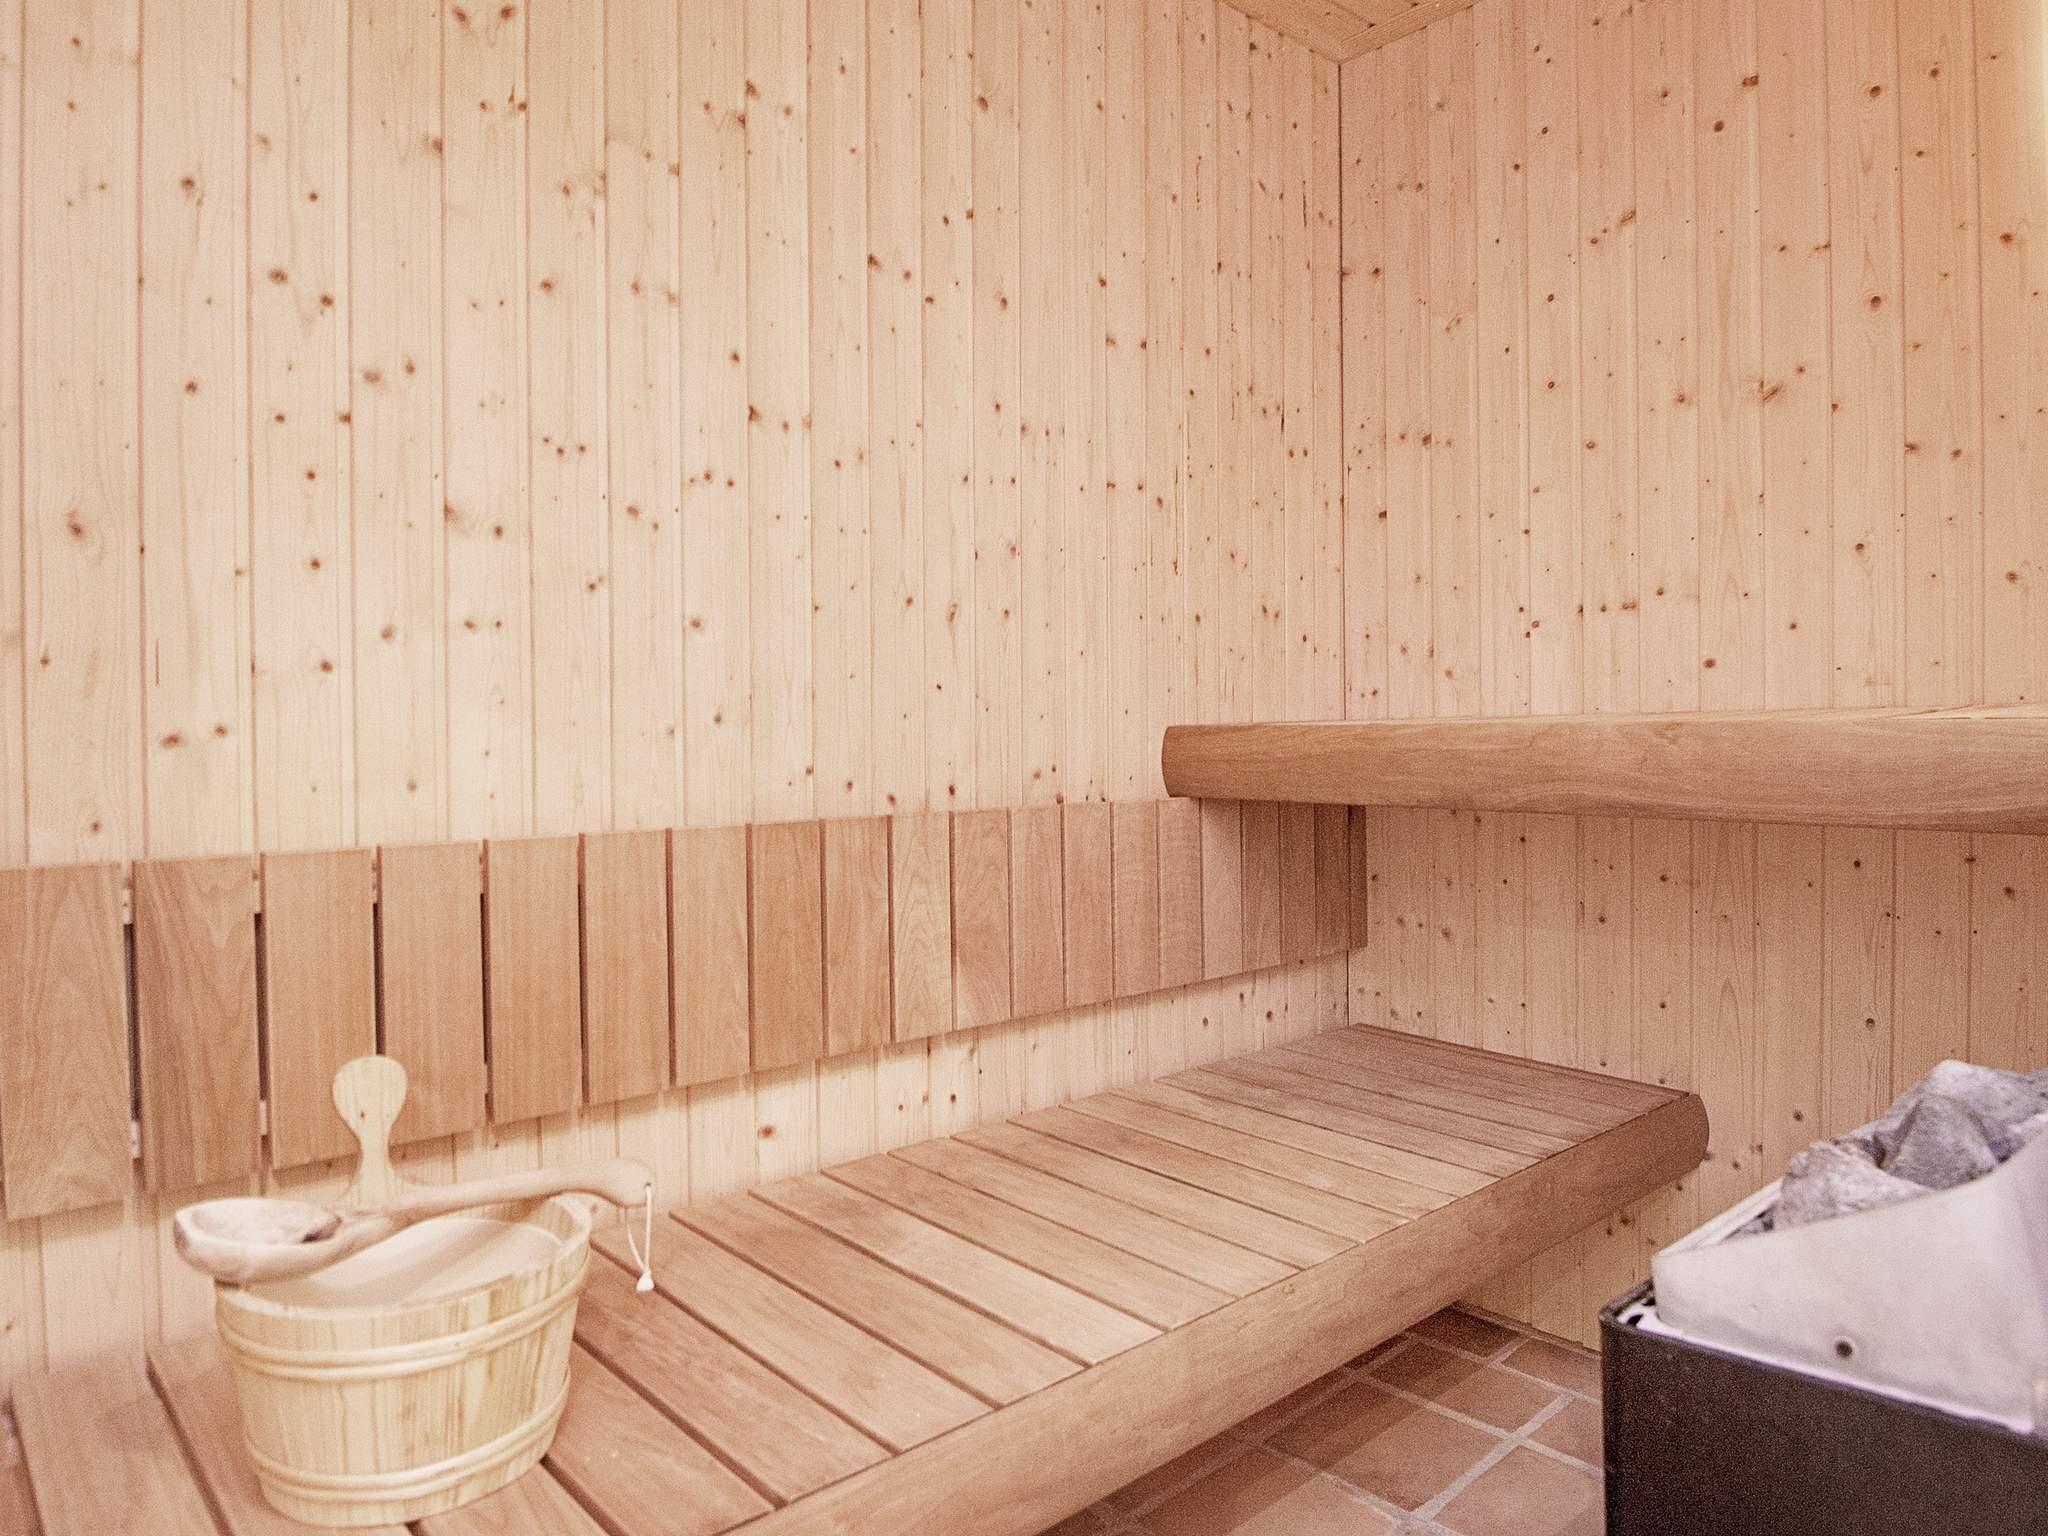 Ferienhaus Handrup Bakker (241700), Handrup, , Ostjütland, Dänemark, Bild 16